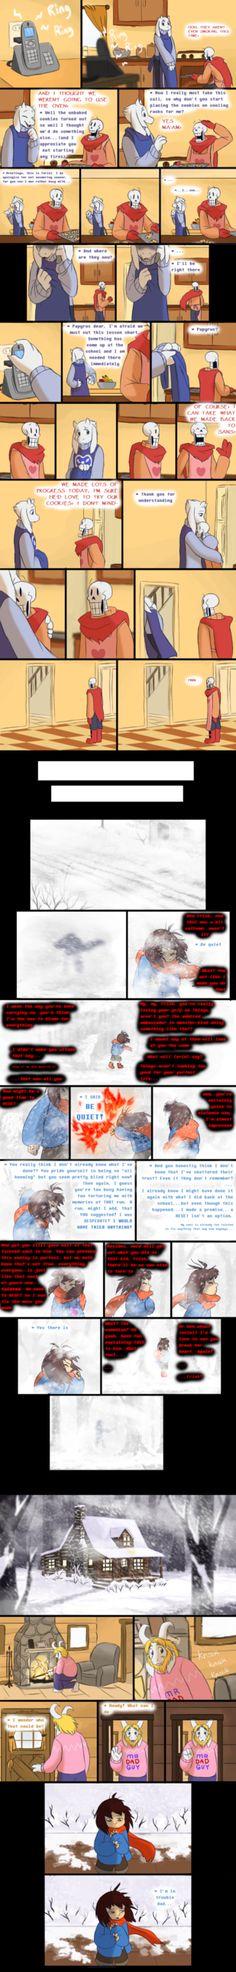 Endertale - Page 24 by TC-96.deviantart.com on @DeviantArt